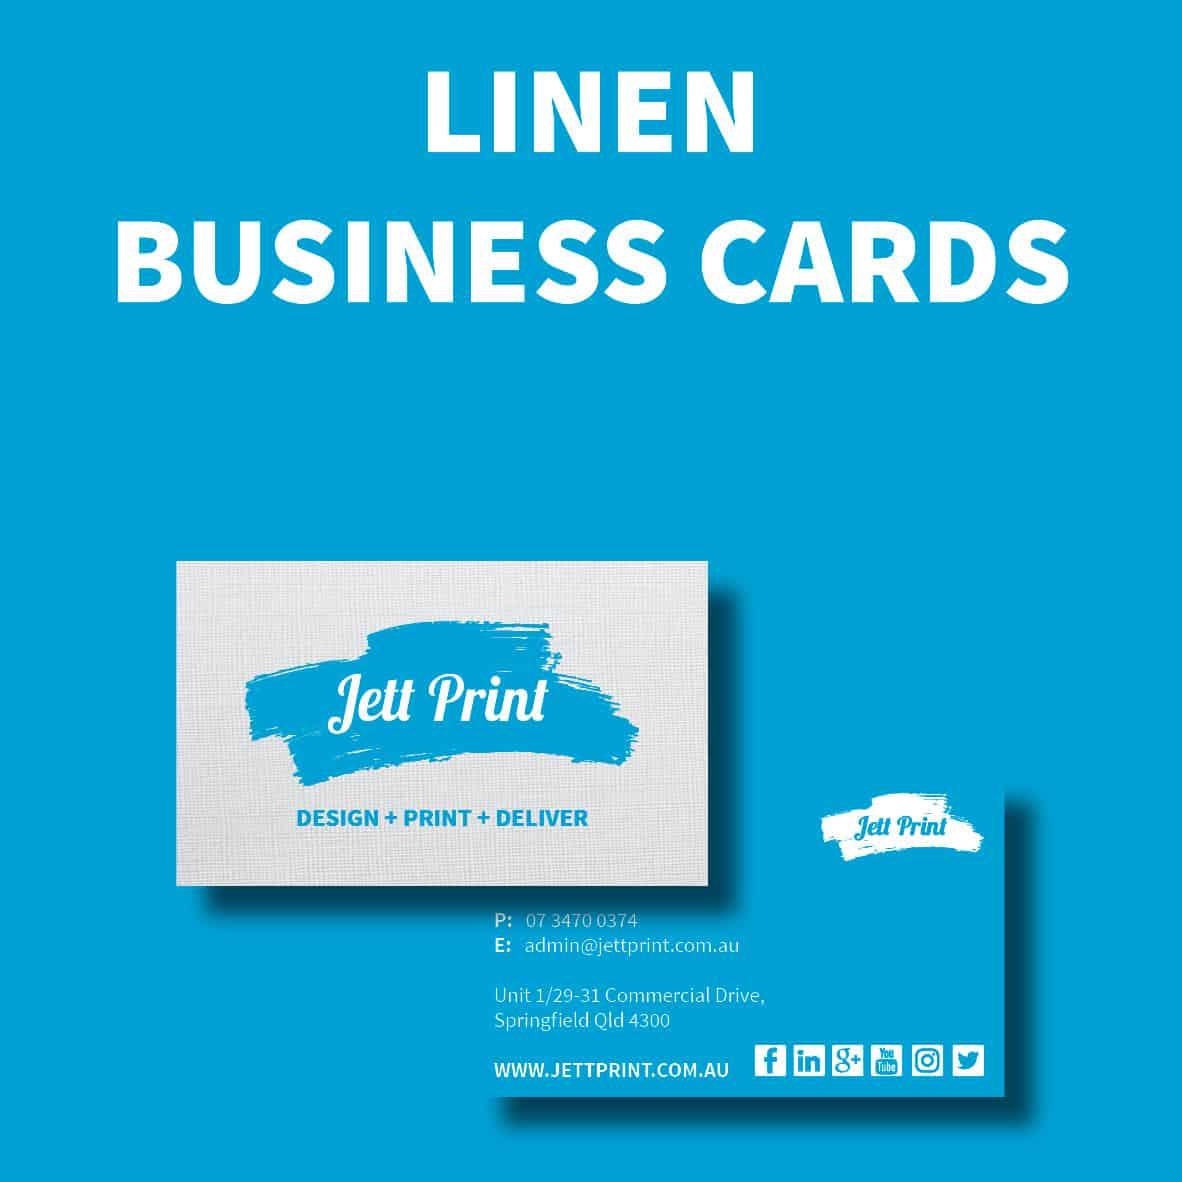 linen-business-cards-printing-springfield-ipswich-brisbane9